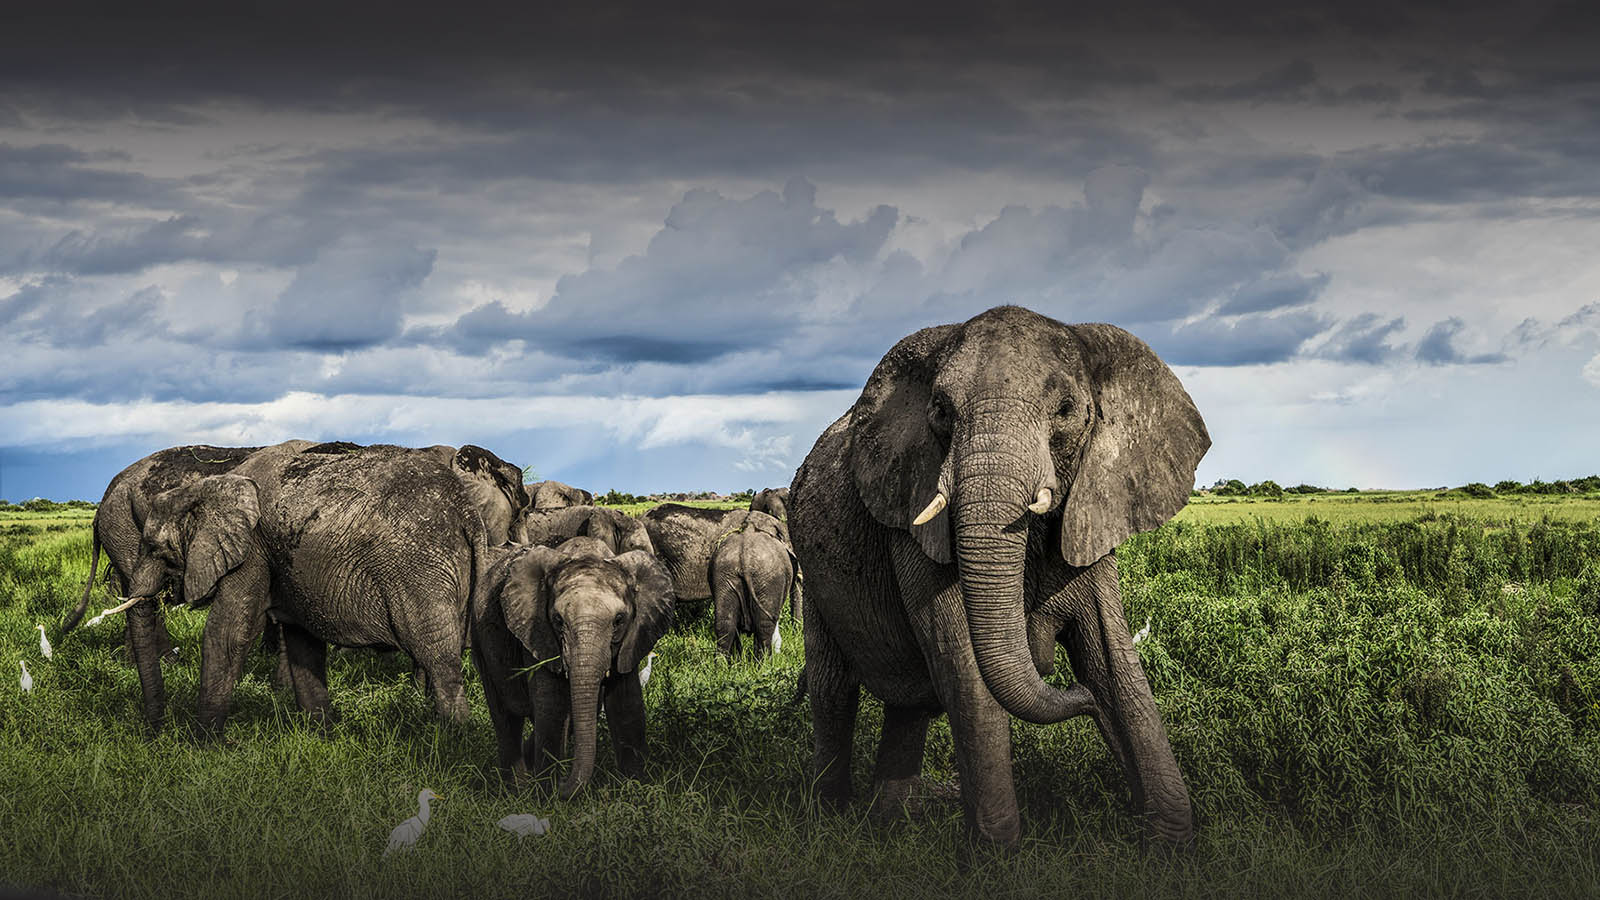 great plains duba explorers camp okavango-delta-botswana-lodges-zambia-in-style-safari-tents-wildlife-elephant-herd-scenic